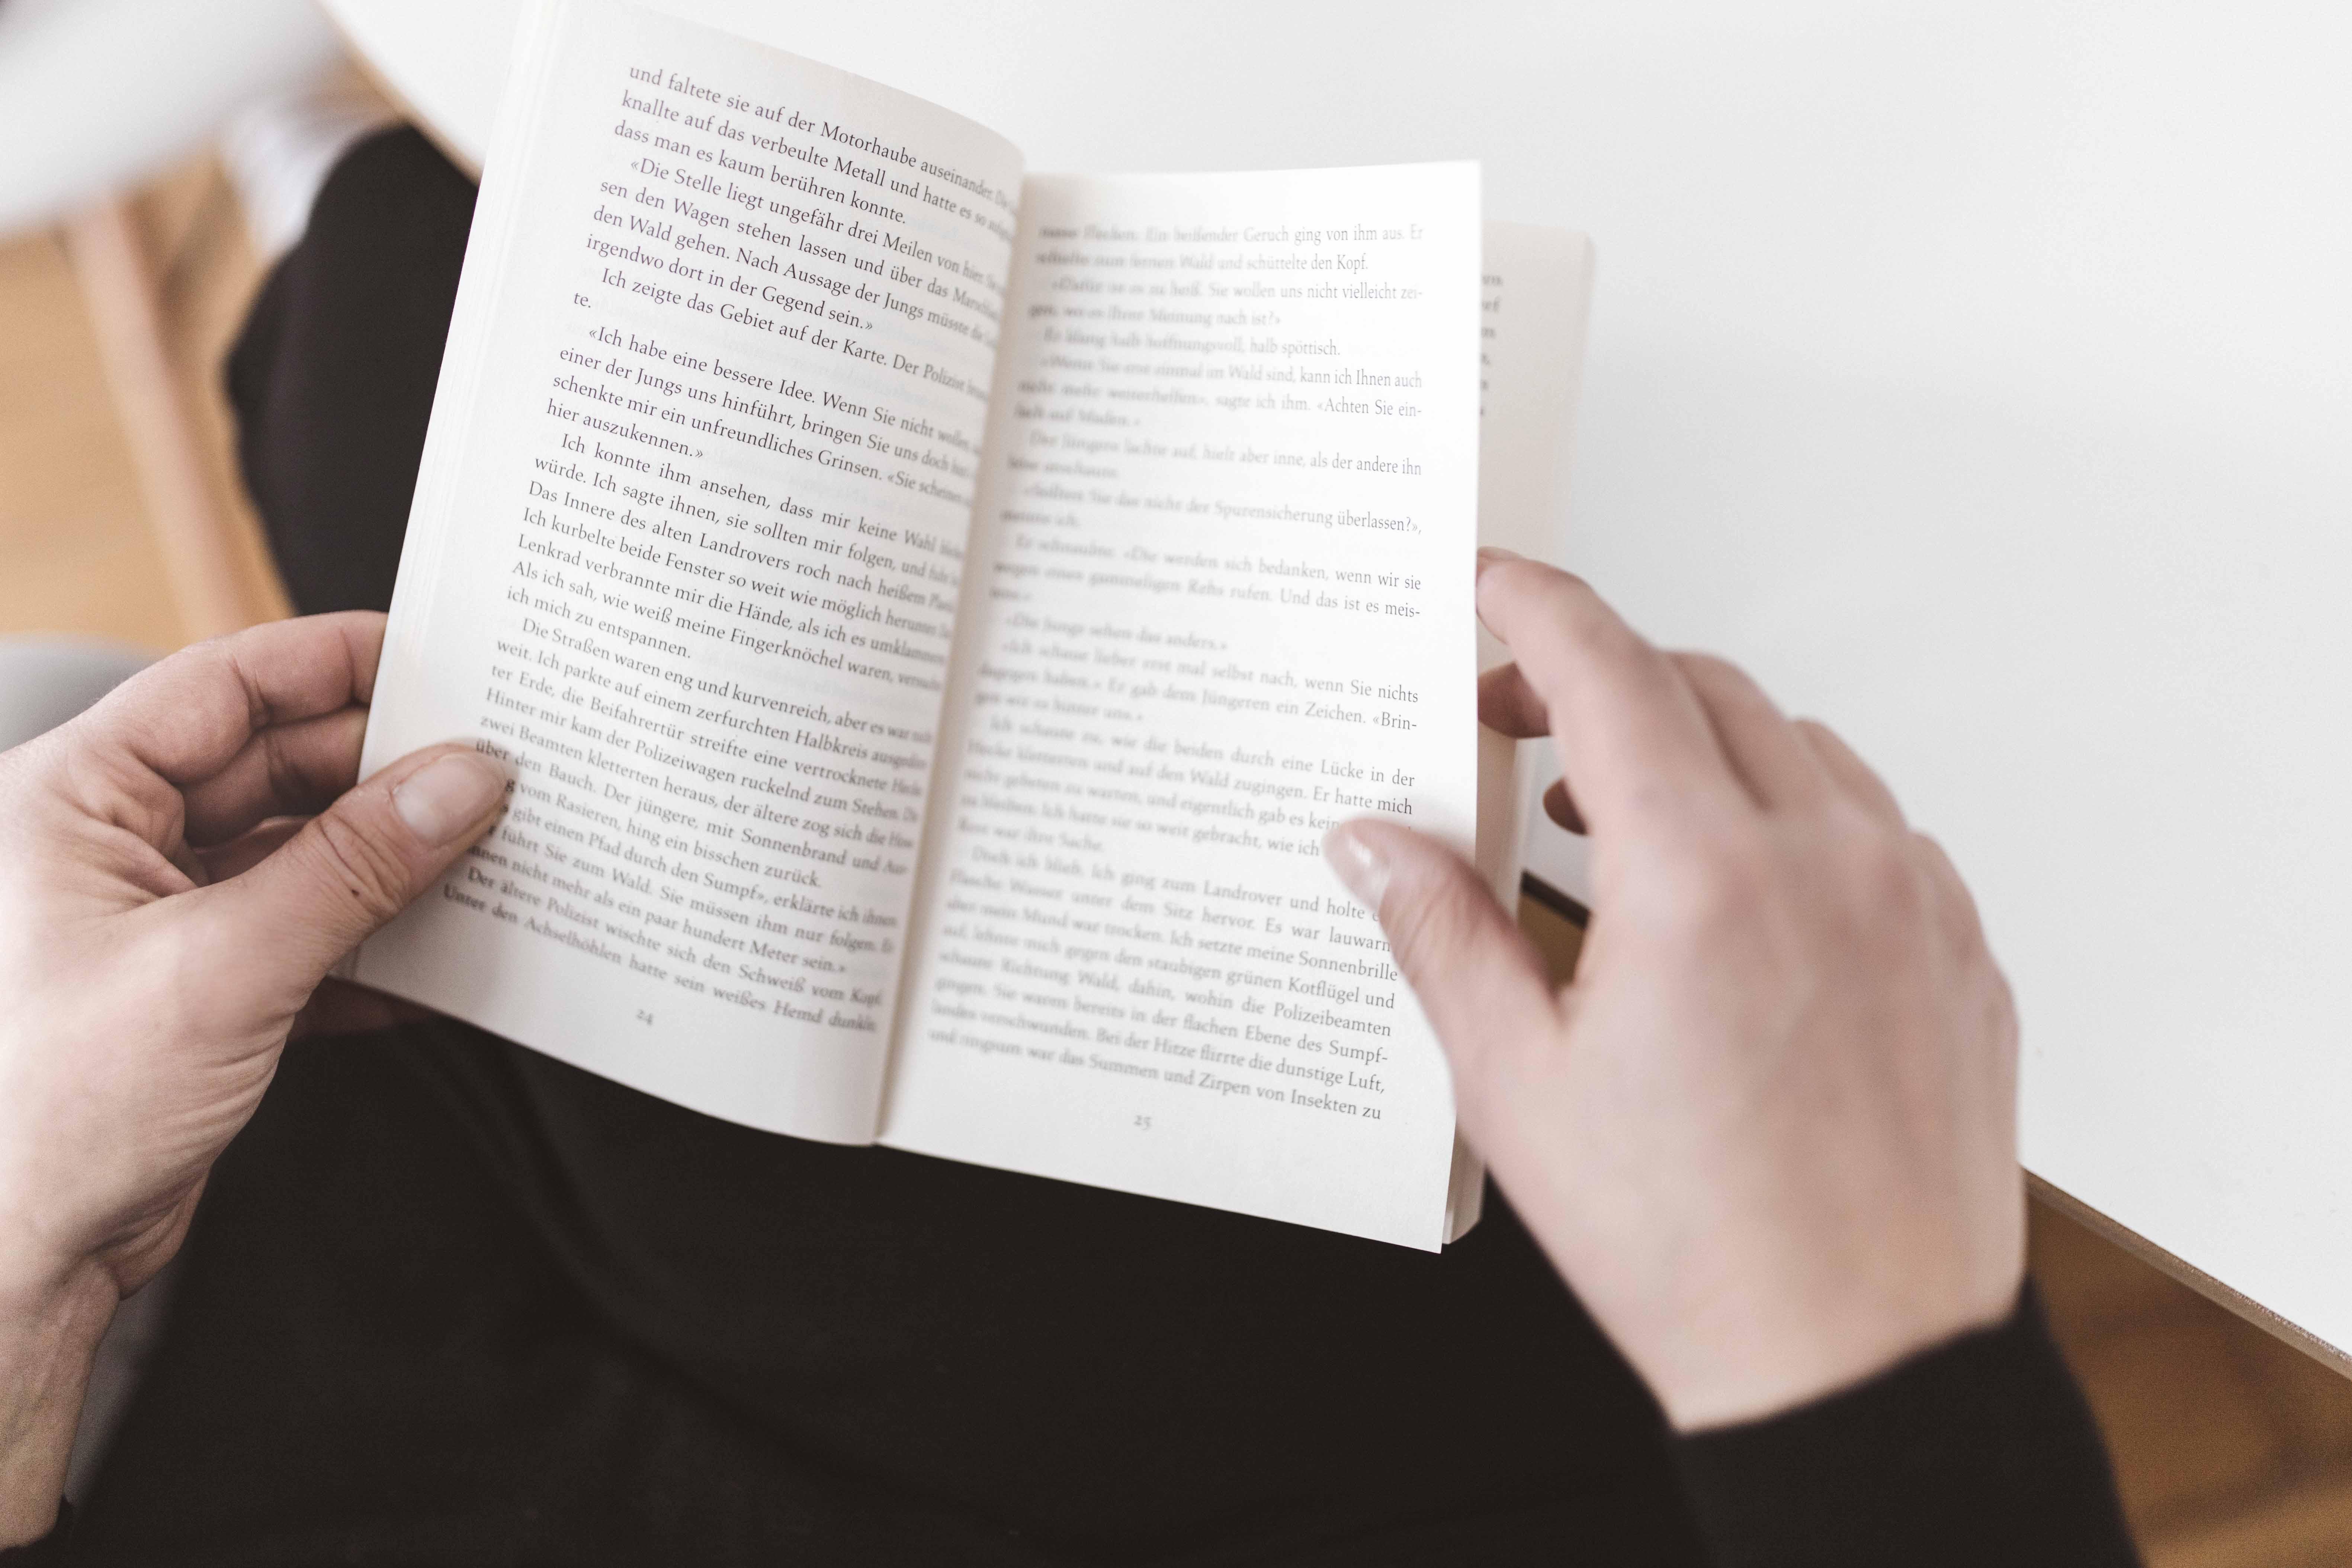 lieblingsbuch, lieblingsbücher, lesen, buch, empfehlung, renate, annalaurakummer